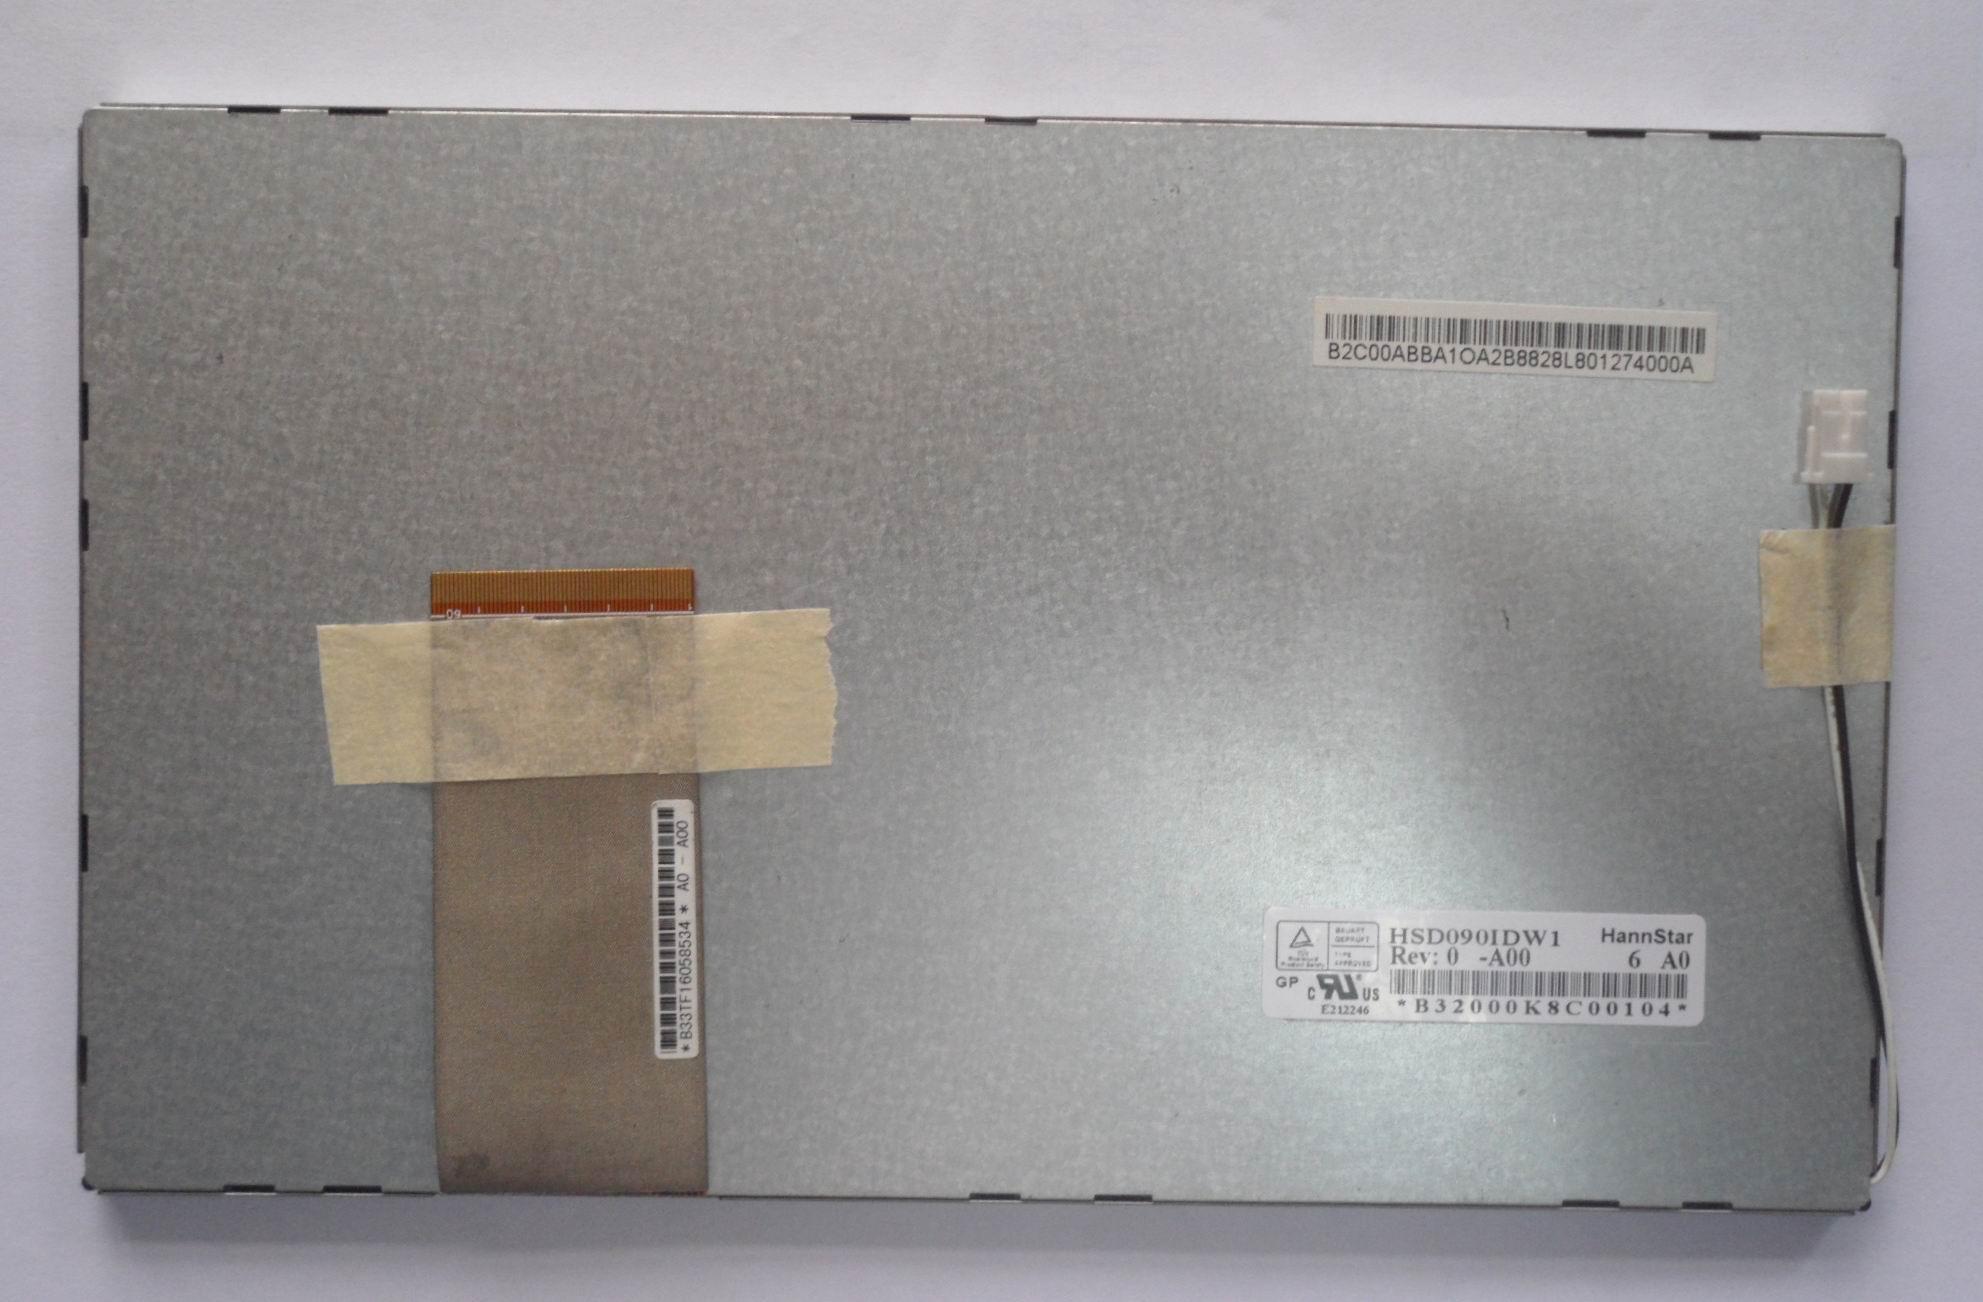 Hsd090idw1 9inch lcd screen hsd090idw1 display<br>